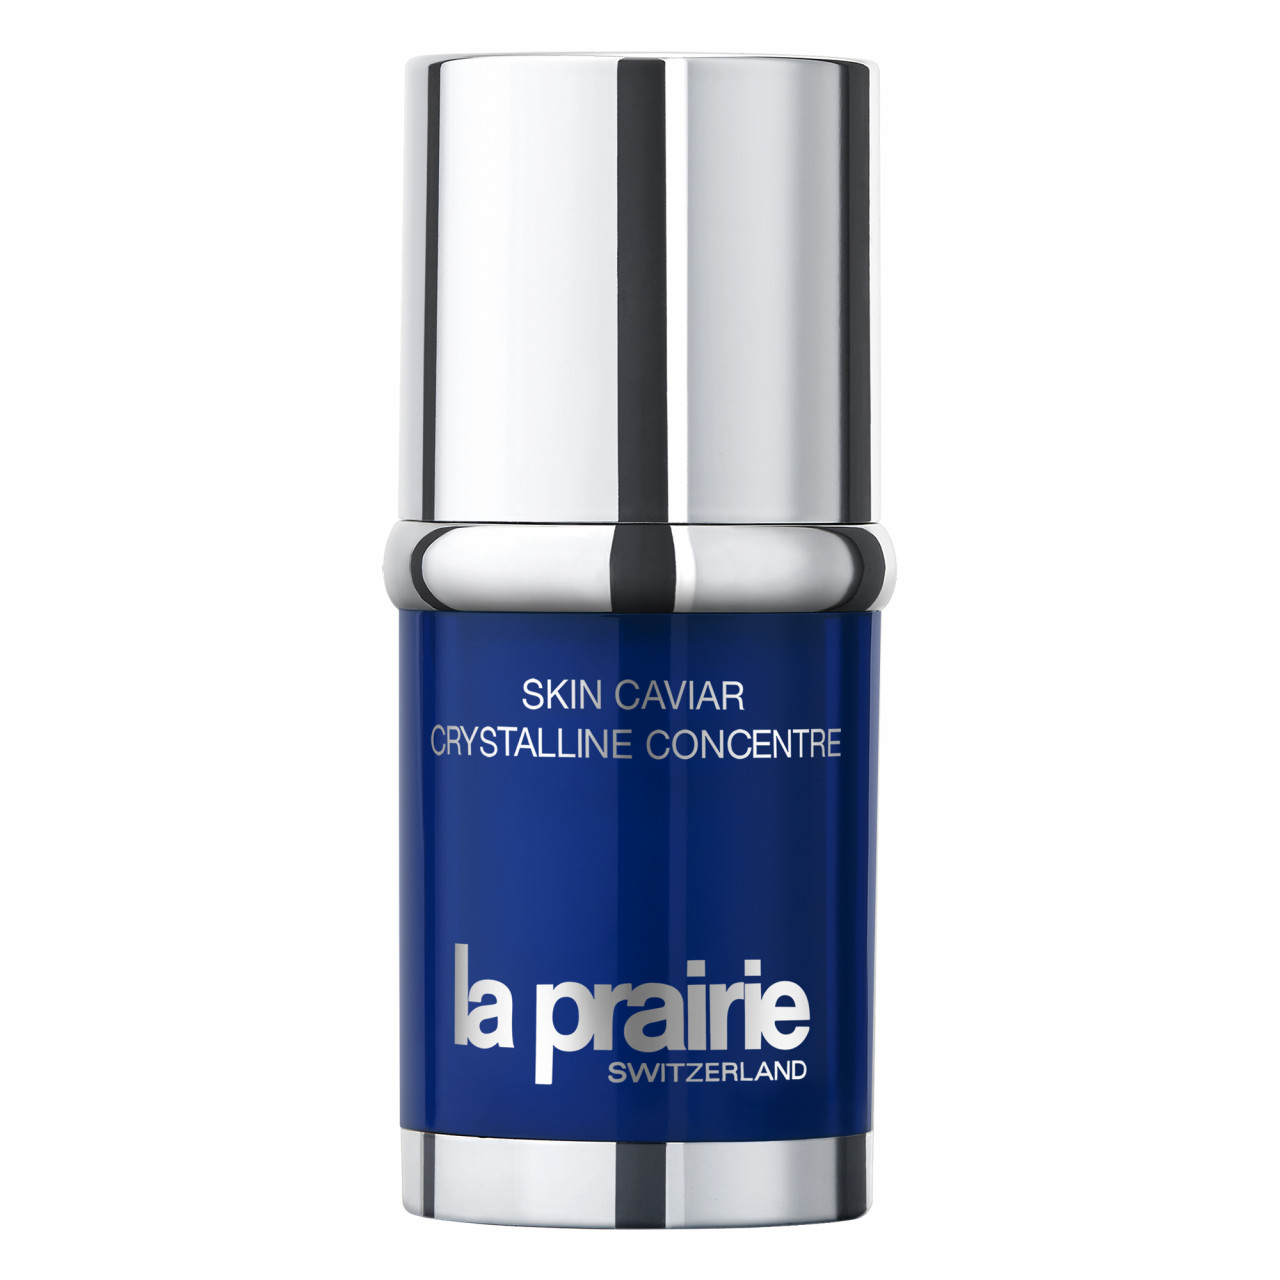 La Prairie Skin Caviar Crystalline Concentré